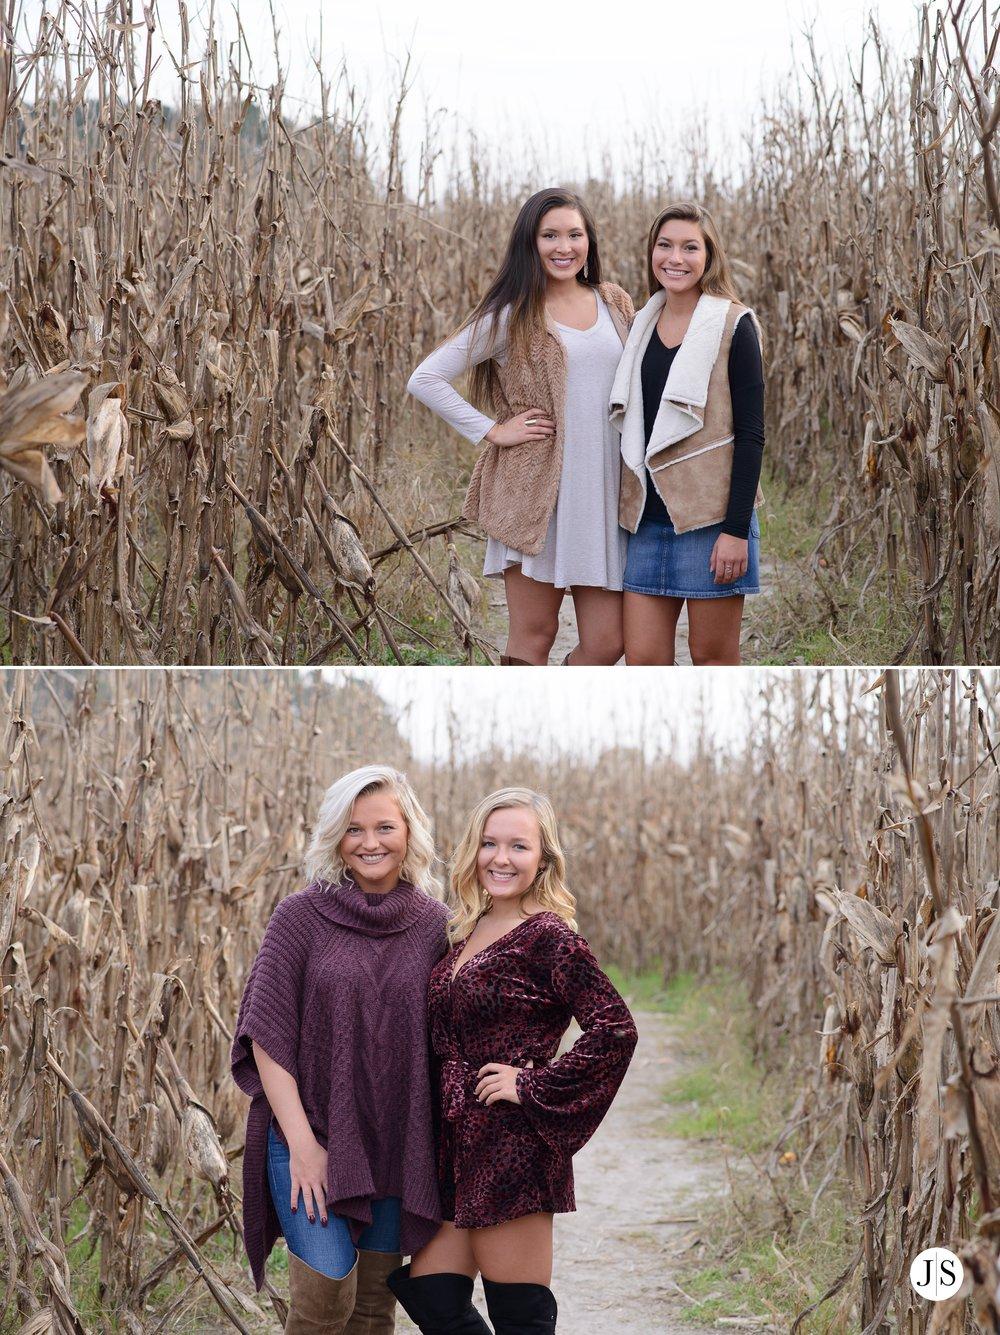 senior-portrait-pumpkins-maryland-adkins-farm-fall-portraits-modelreps-photo 8.jpg